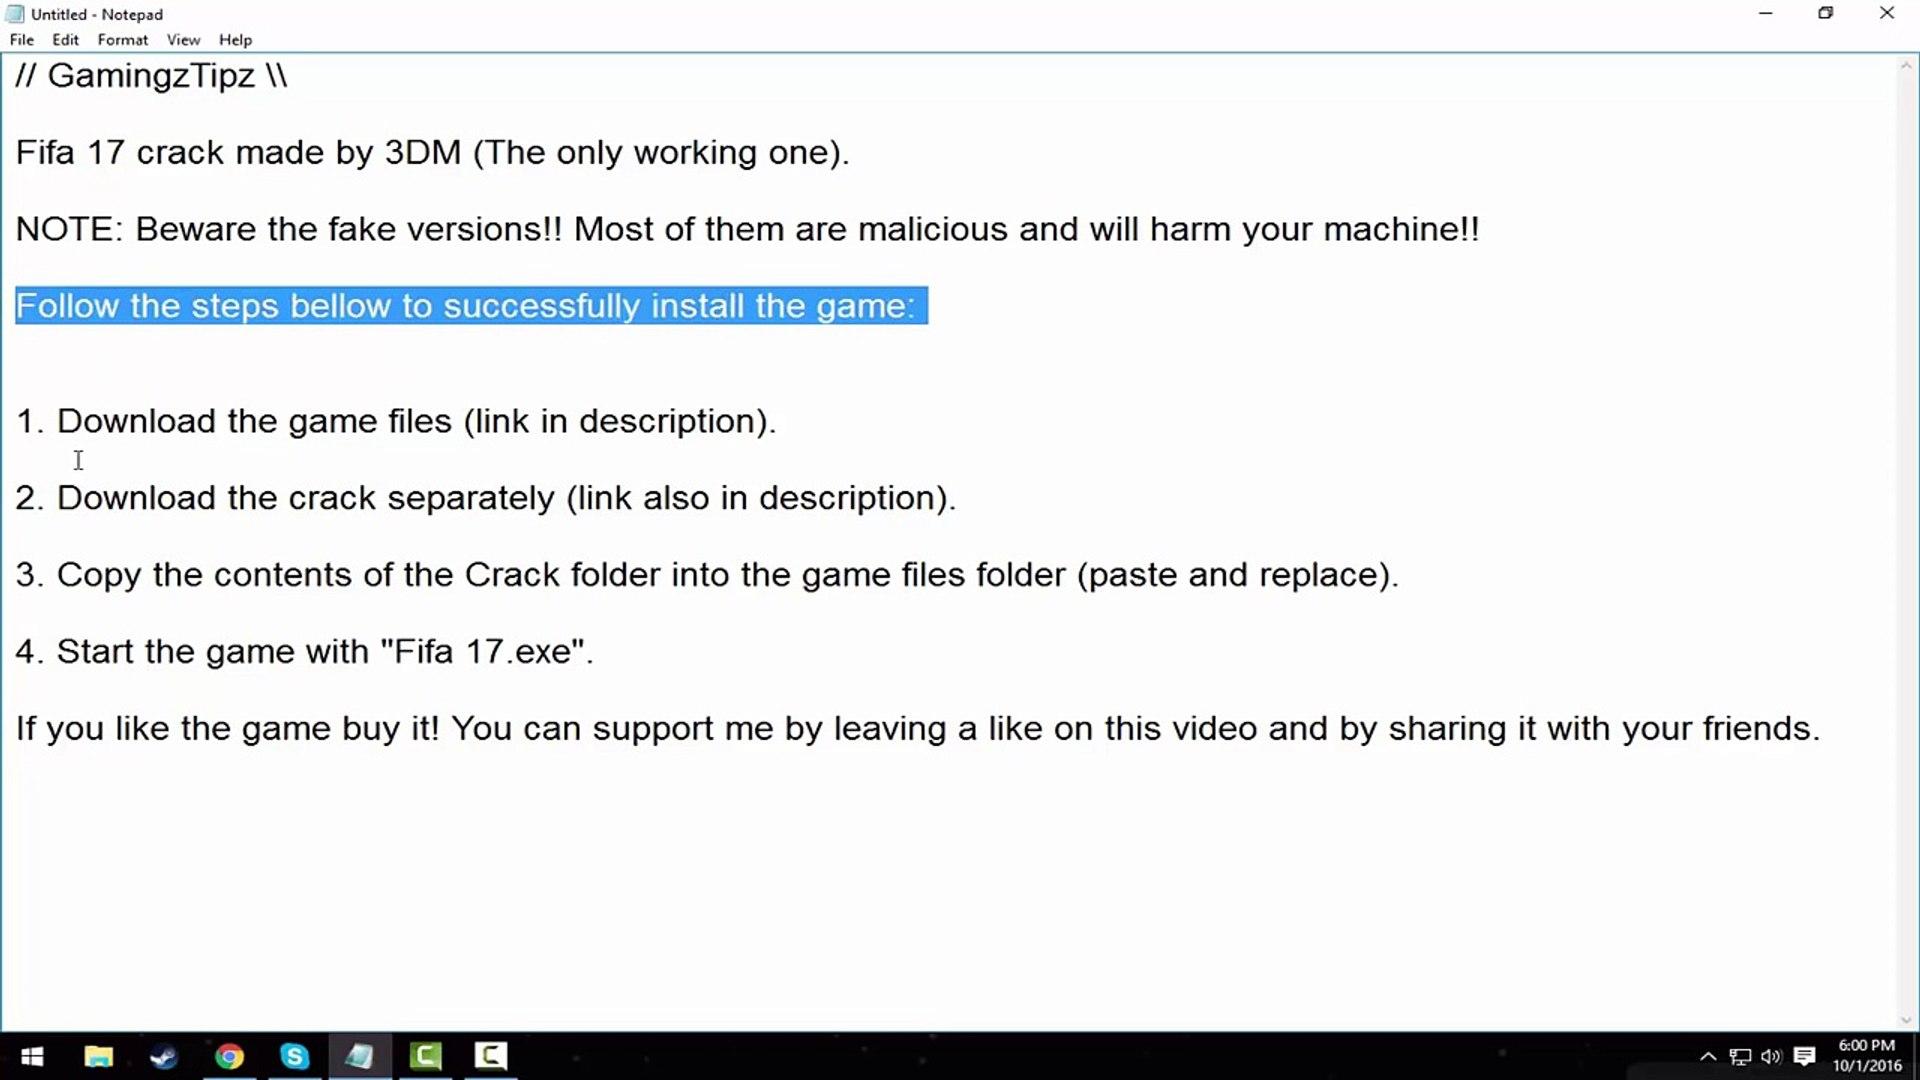 fifa 17 license key generator download